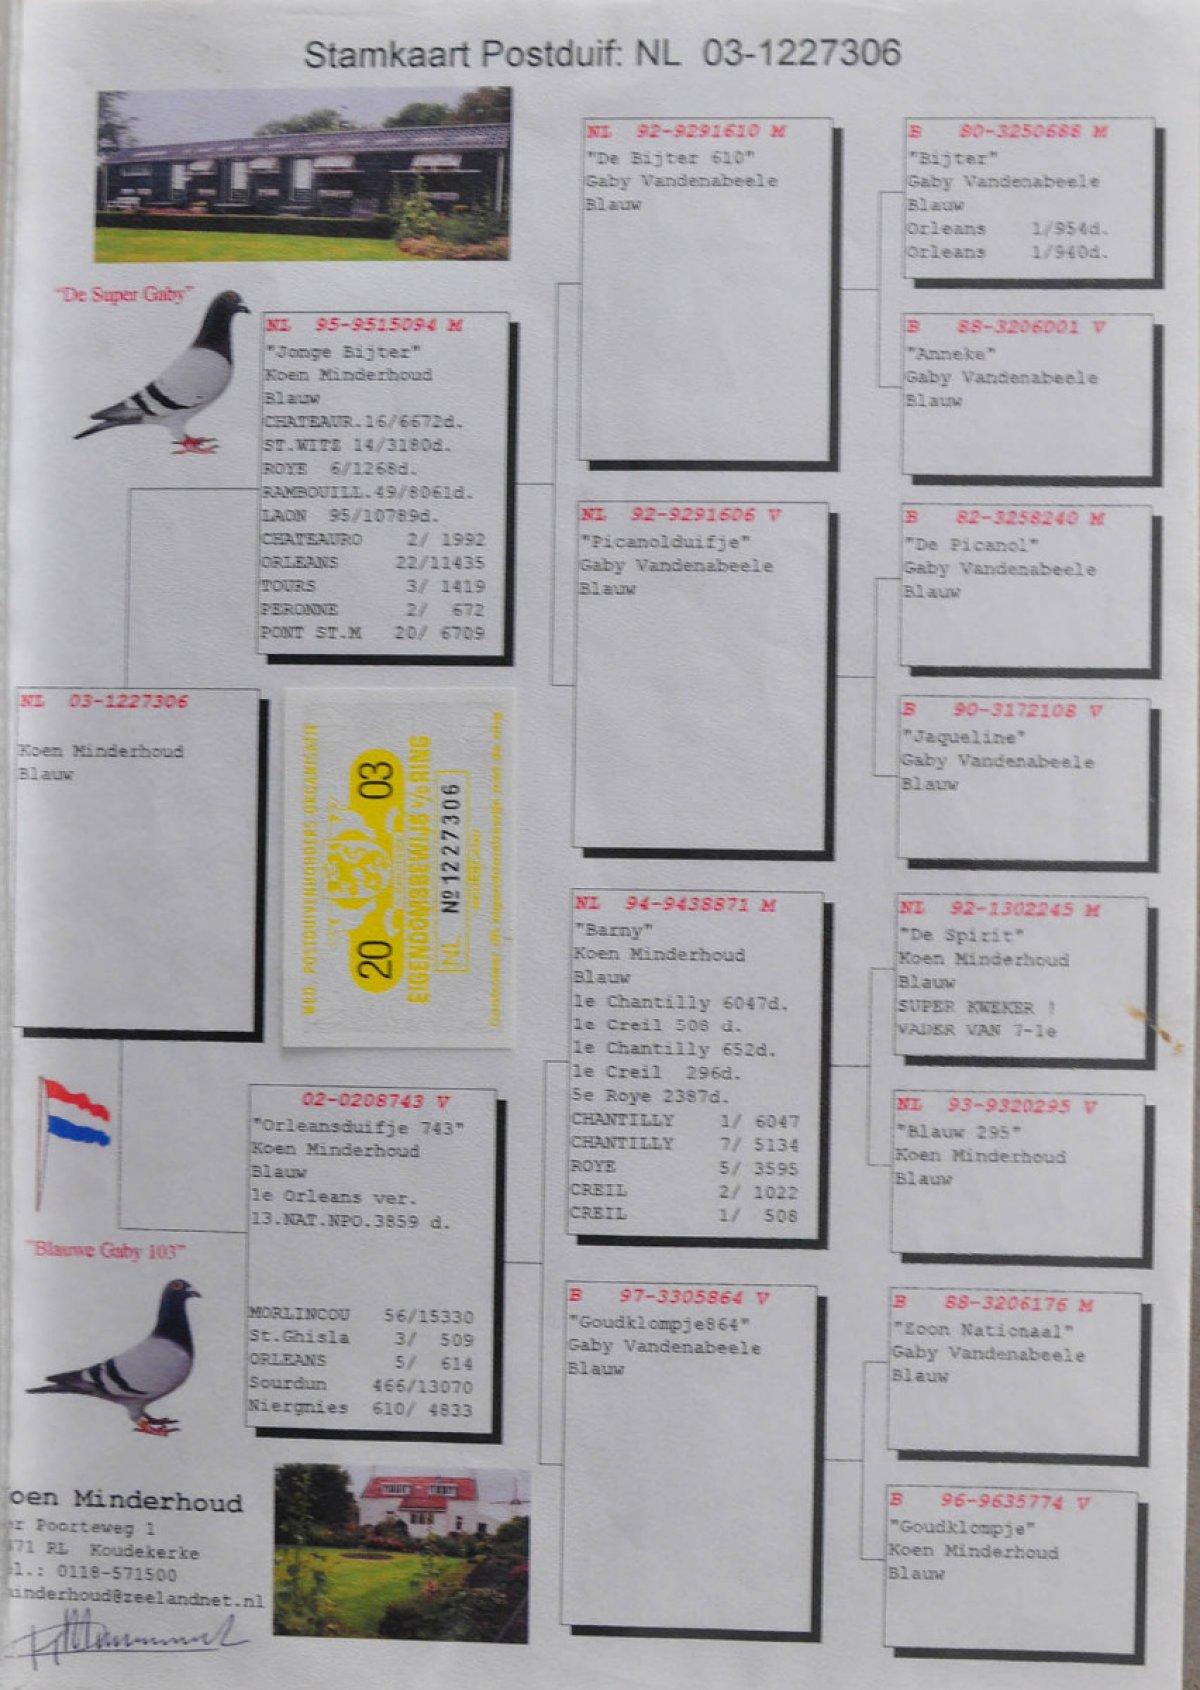 nl-03-1227306-rod